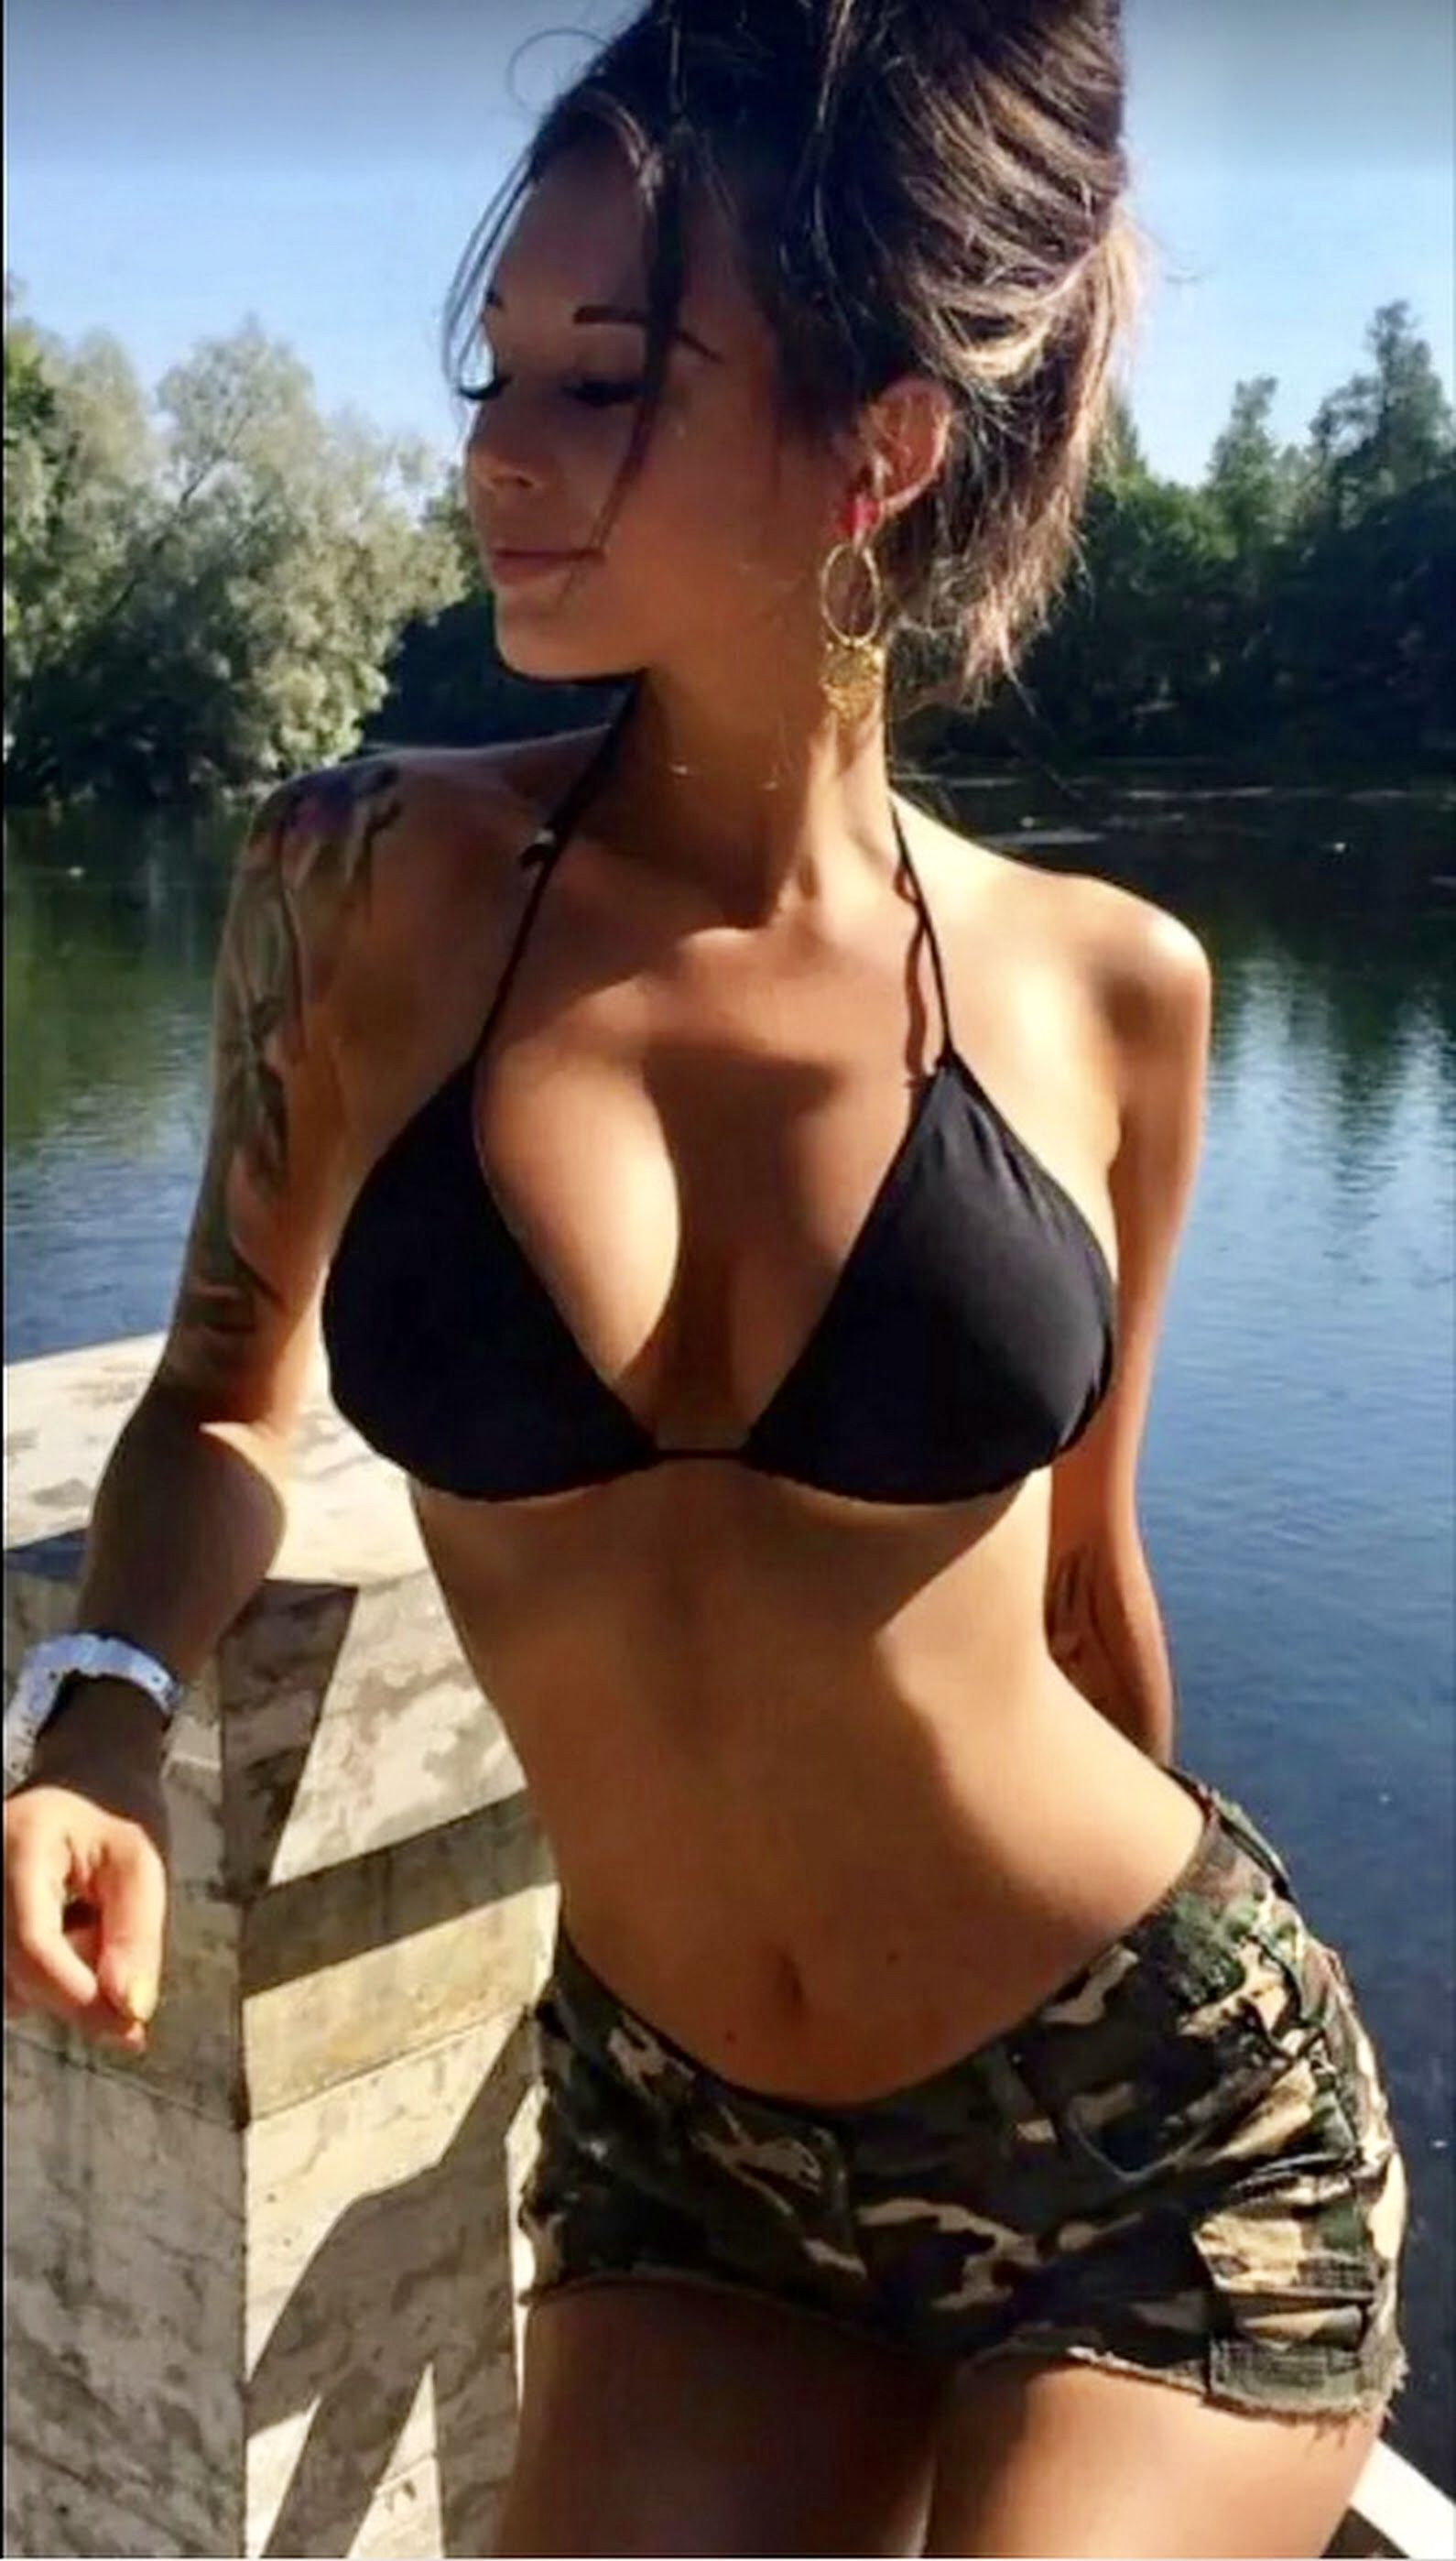 Bikini Julia Kovalchuk nudes (93 foto and video), Pussy, Hot, Selfie, underwear 2018